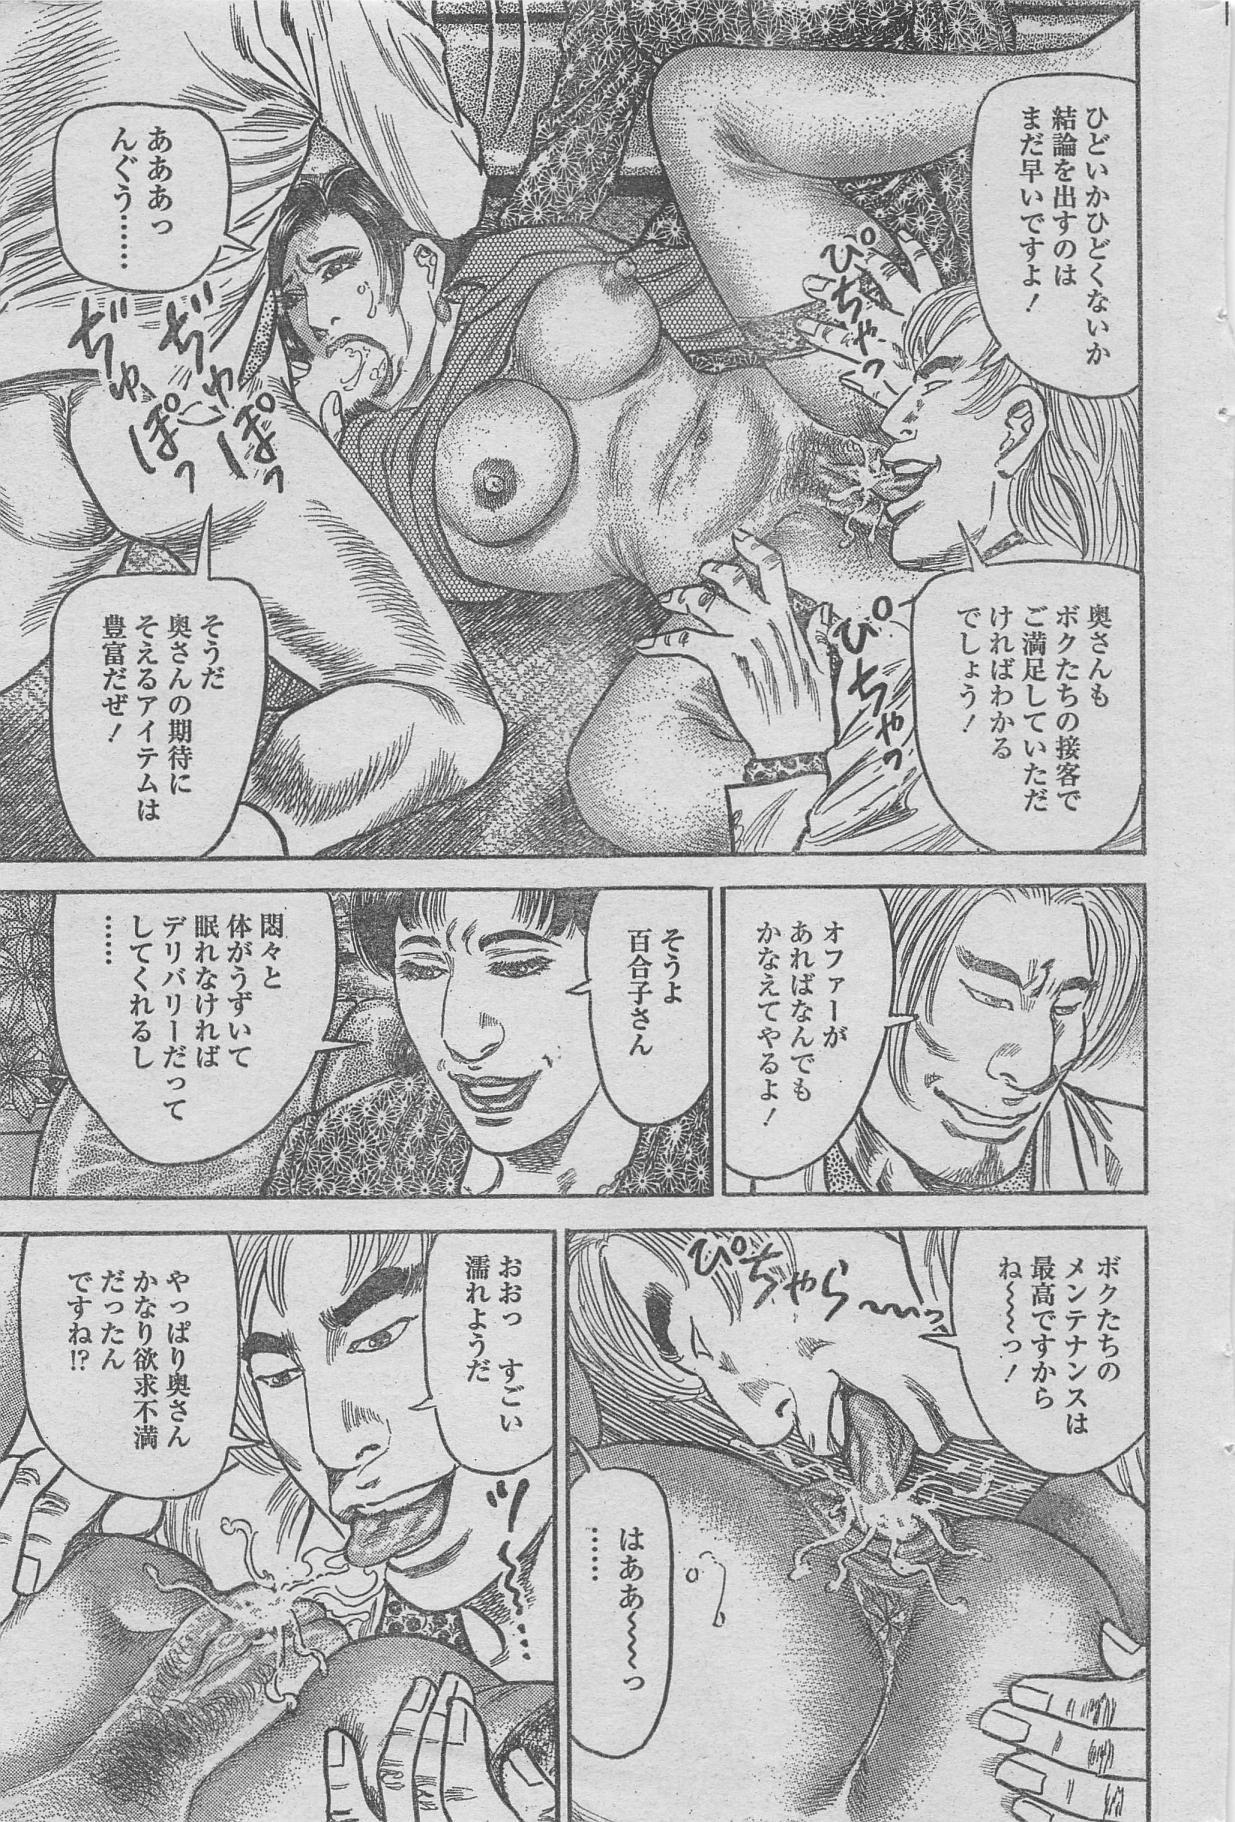 Manga Lawrence 2013-04 58